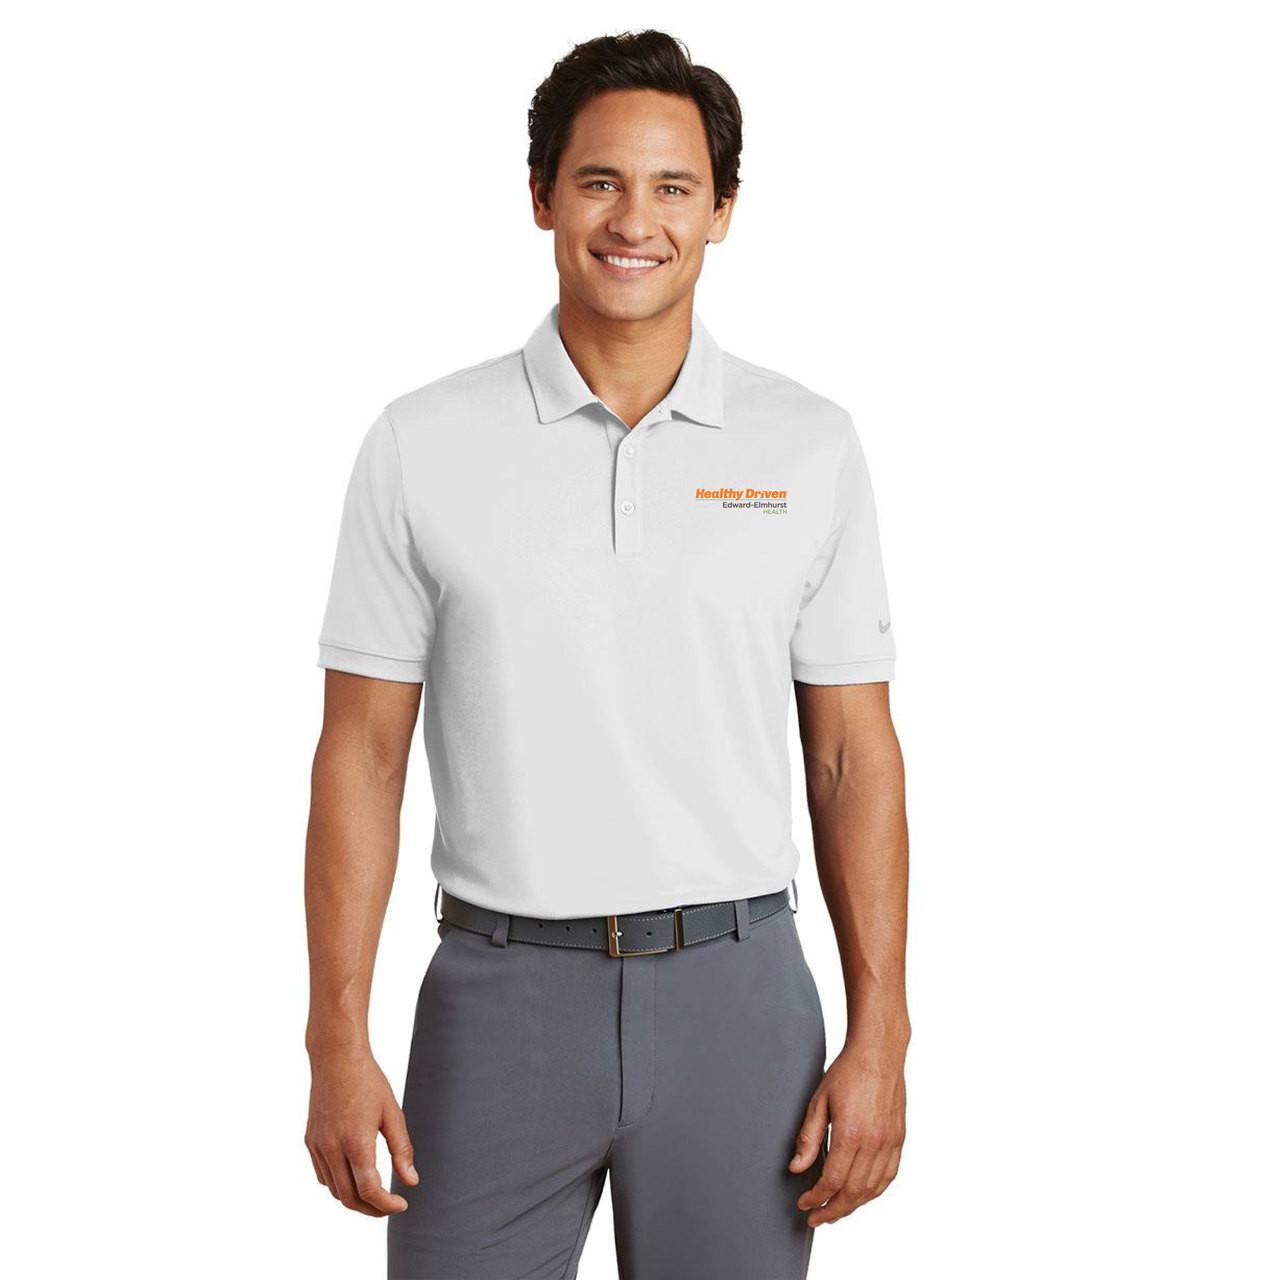 c0d713f37 Nike Golf Dri-FIT Players Modern Fit Polo